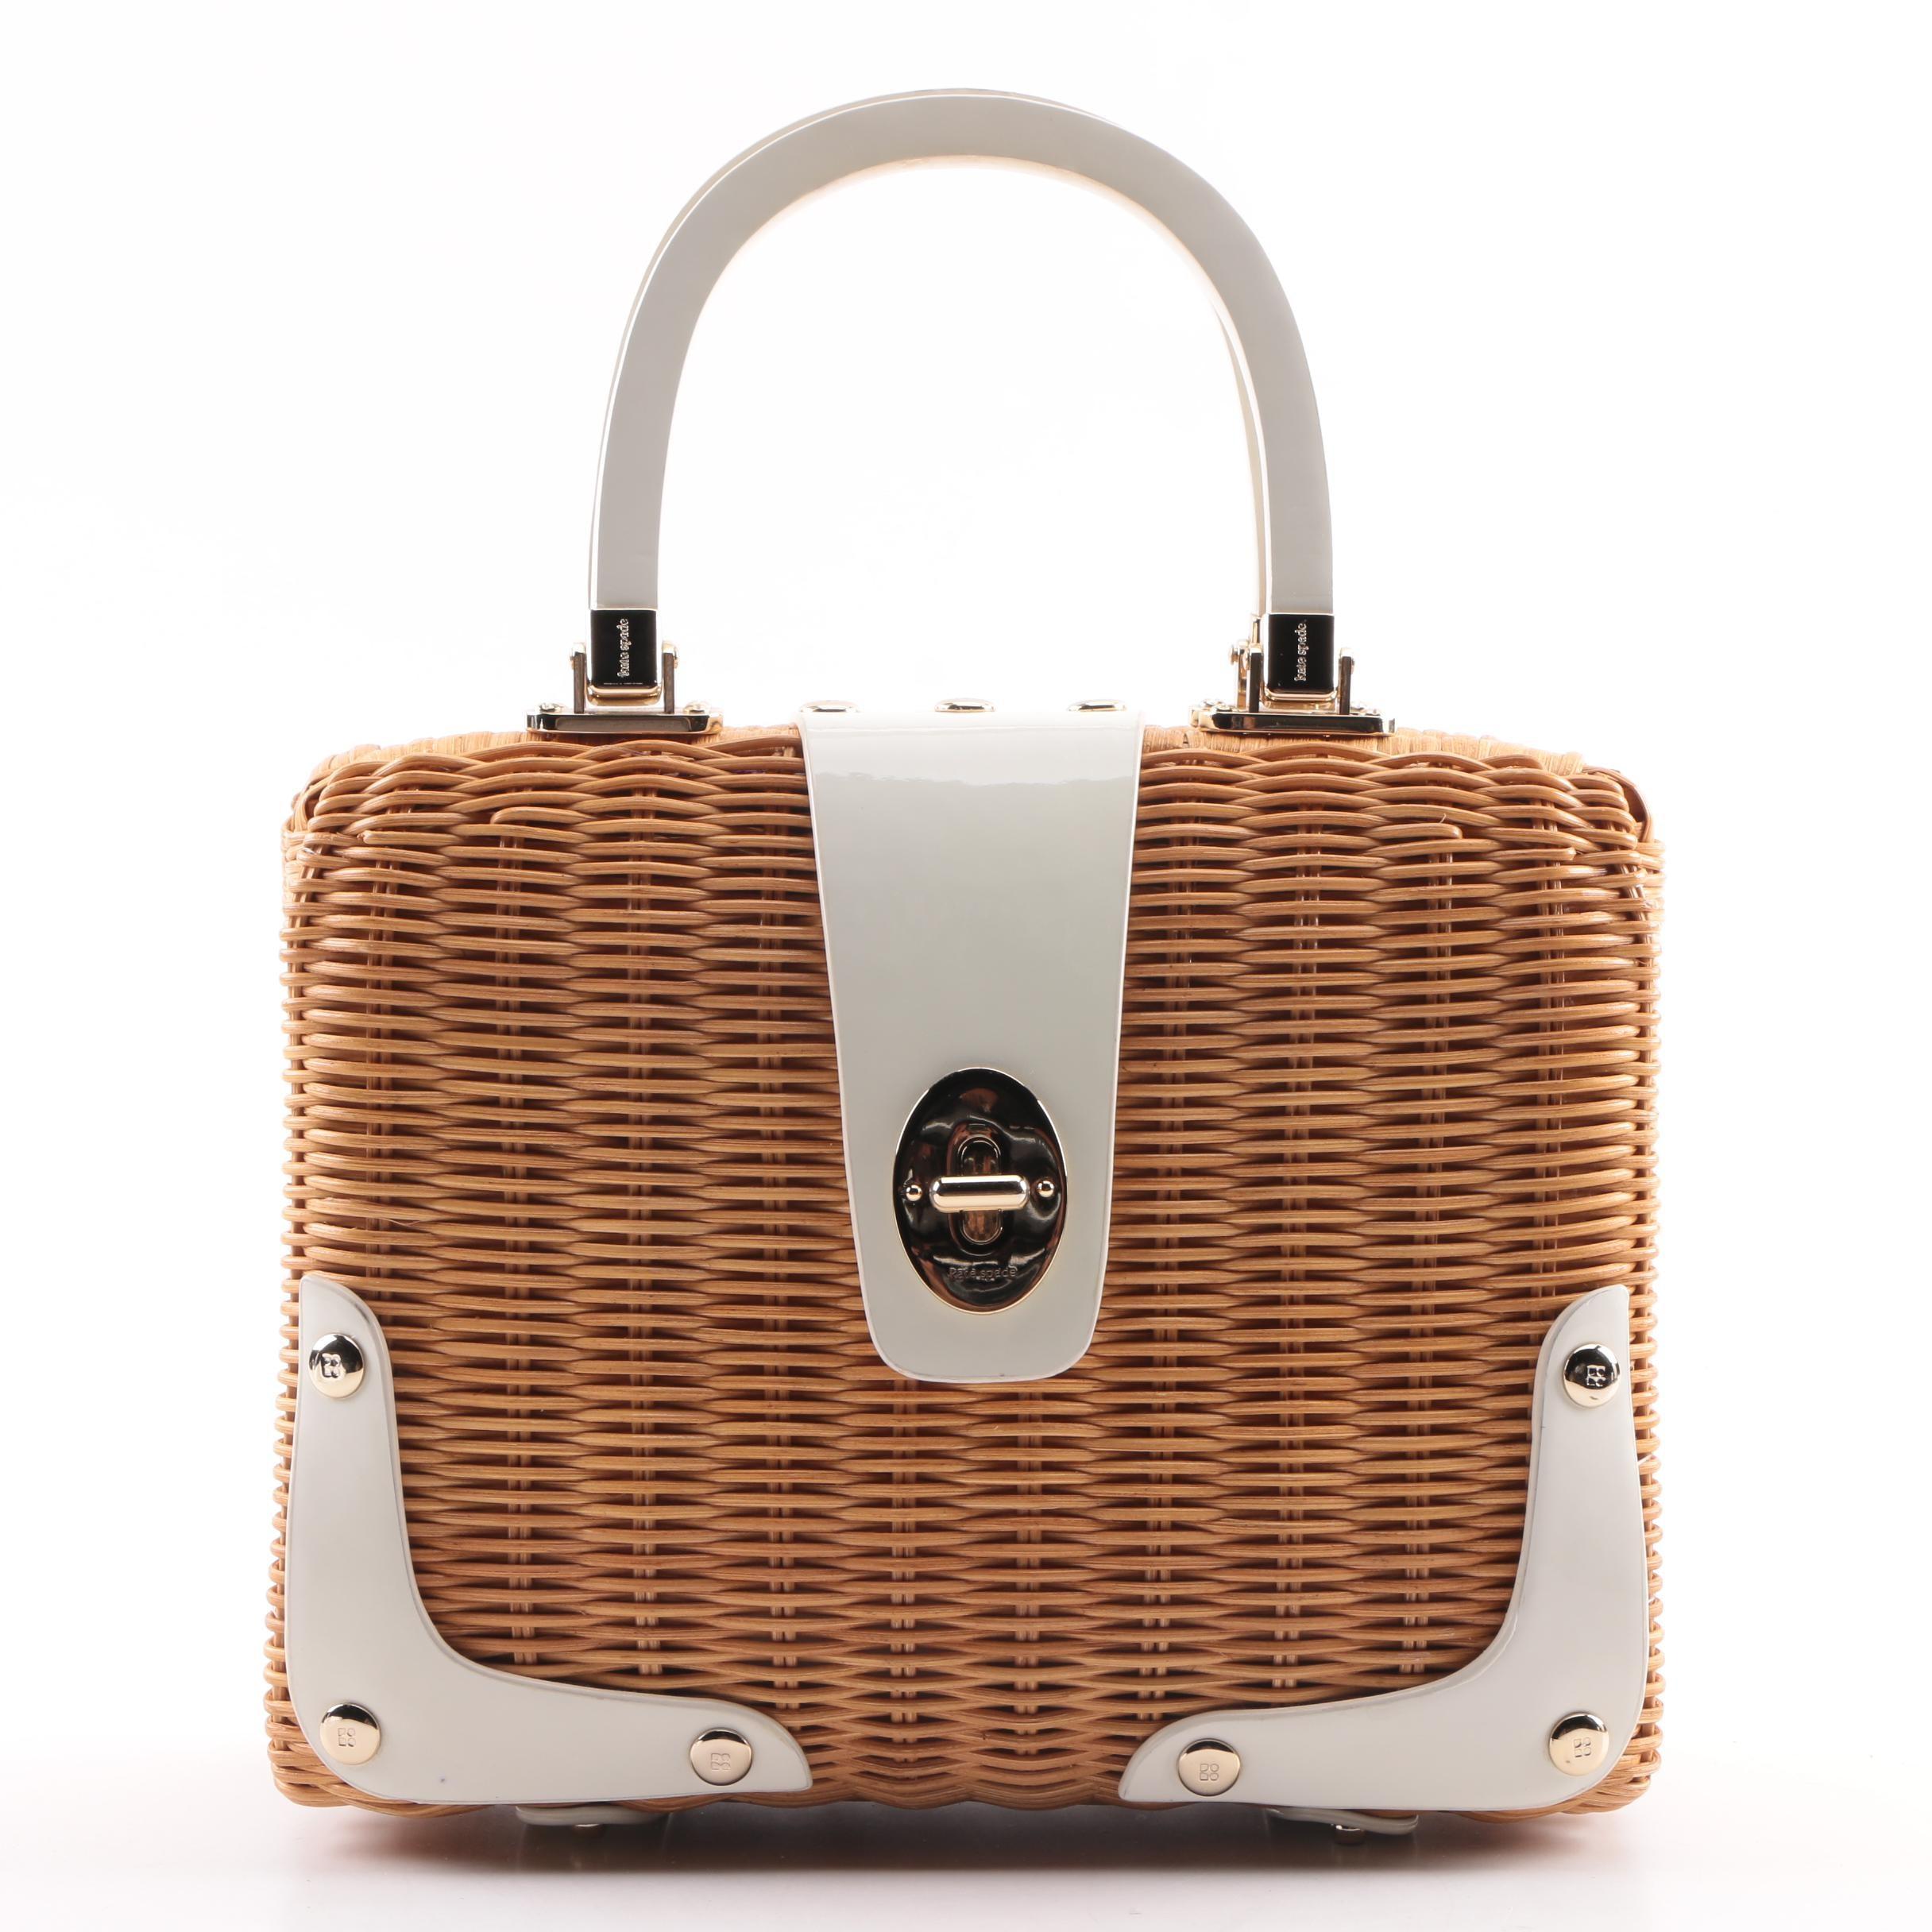 Kate Spade New York Sossity Little Compton Basket Bag